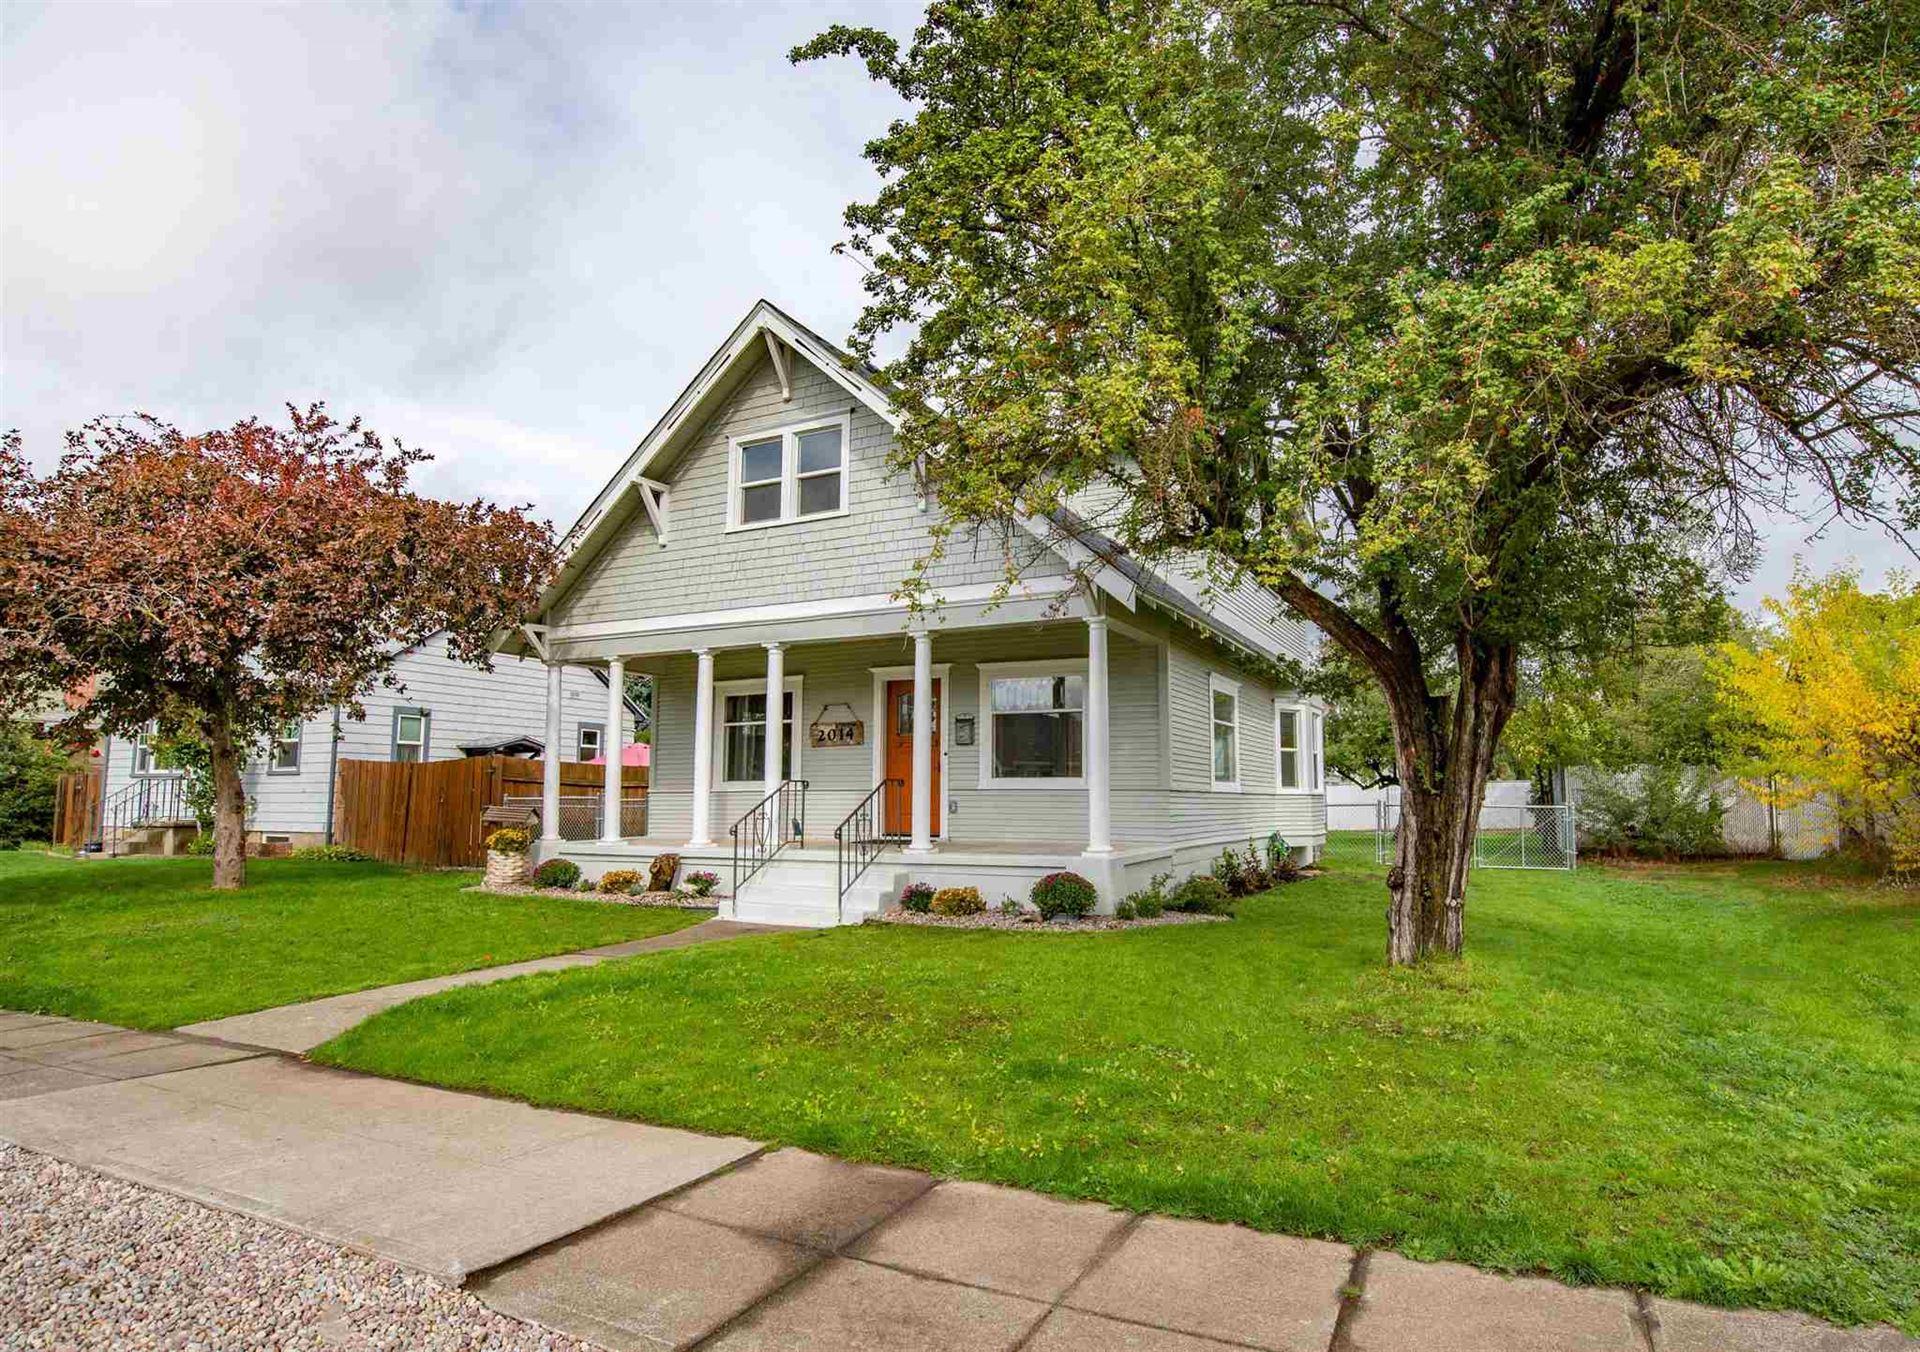 2014 W Knox Ave, Spokane, WA 99205 - #: 202123195